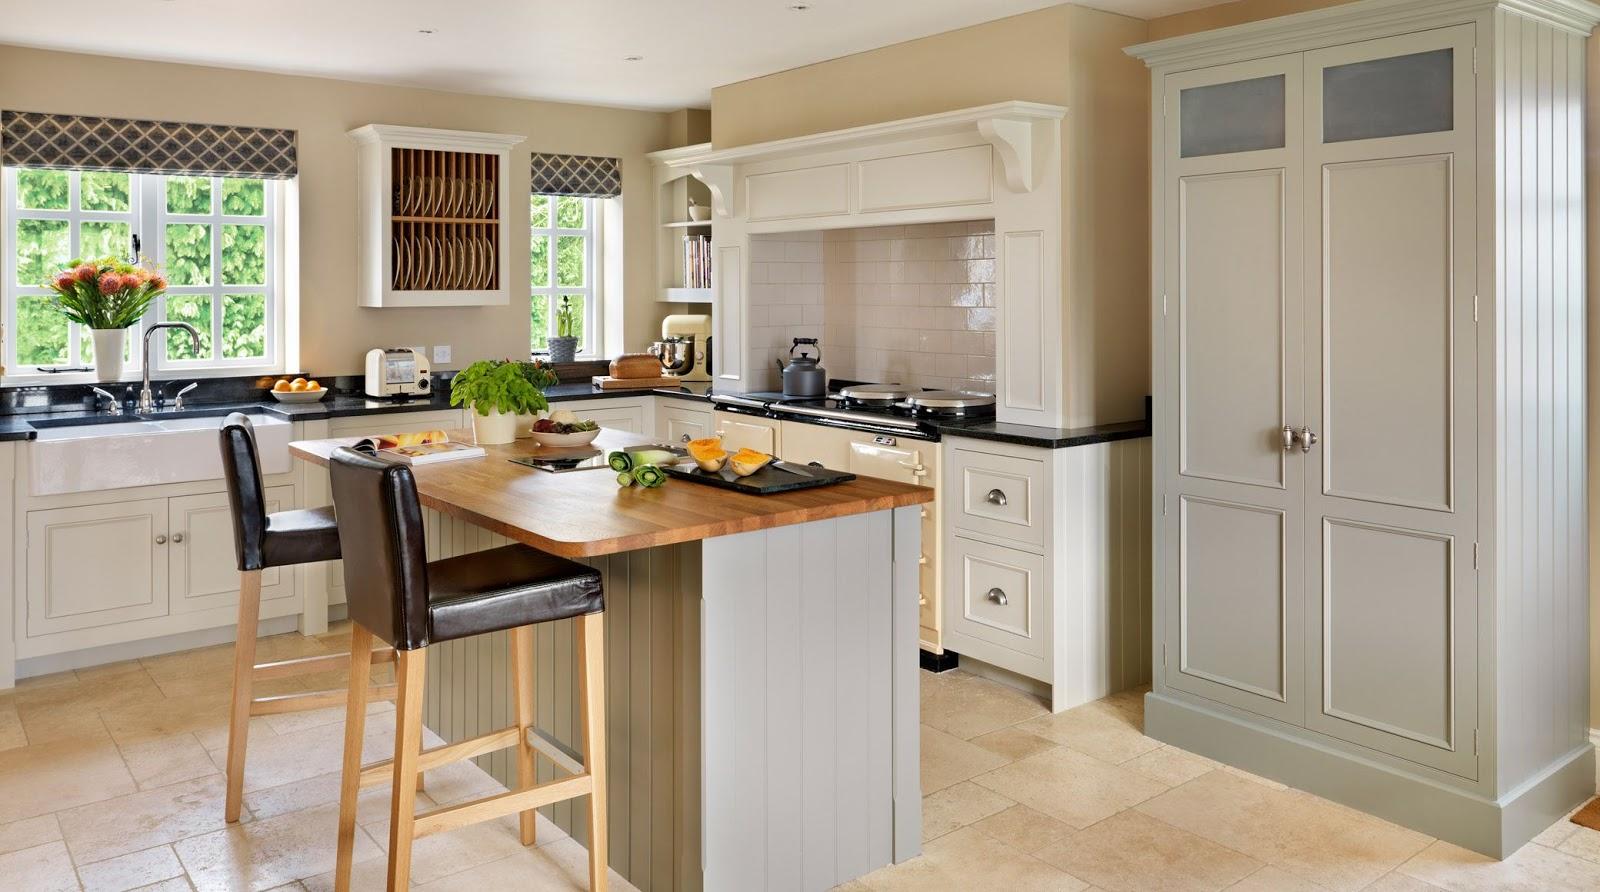 Kitchen Cabinets Eggshell Pale Powder